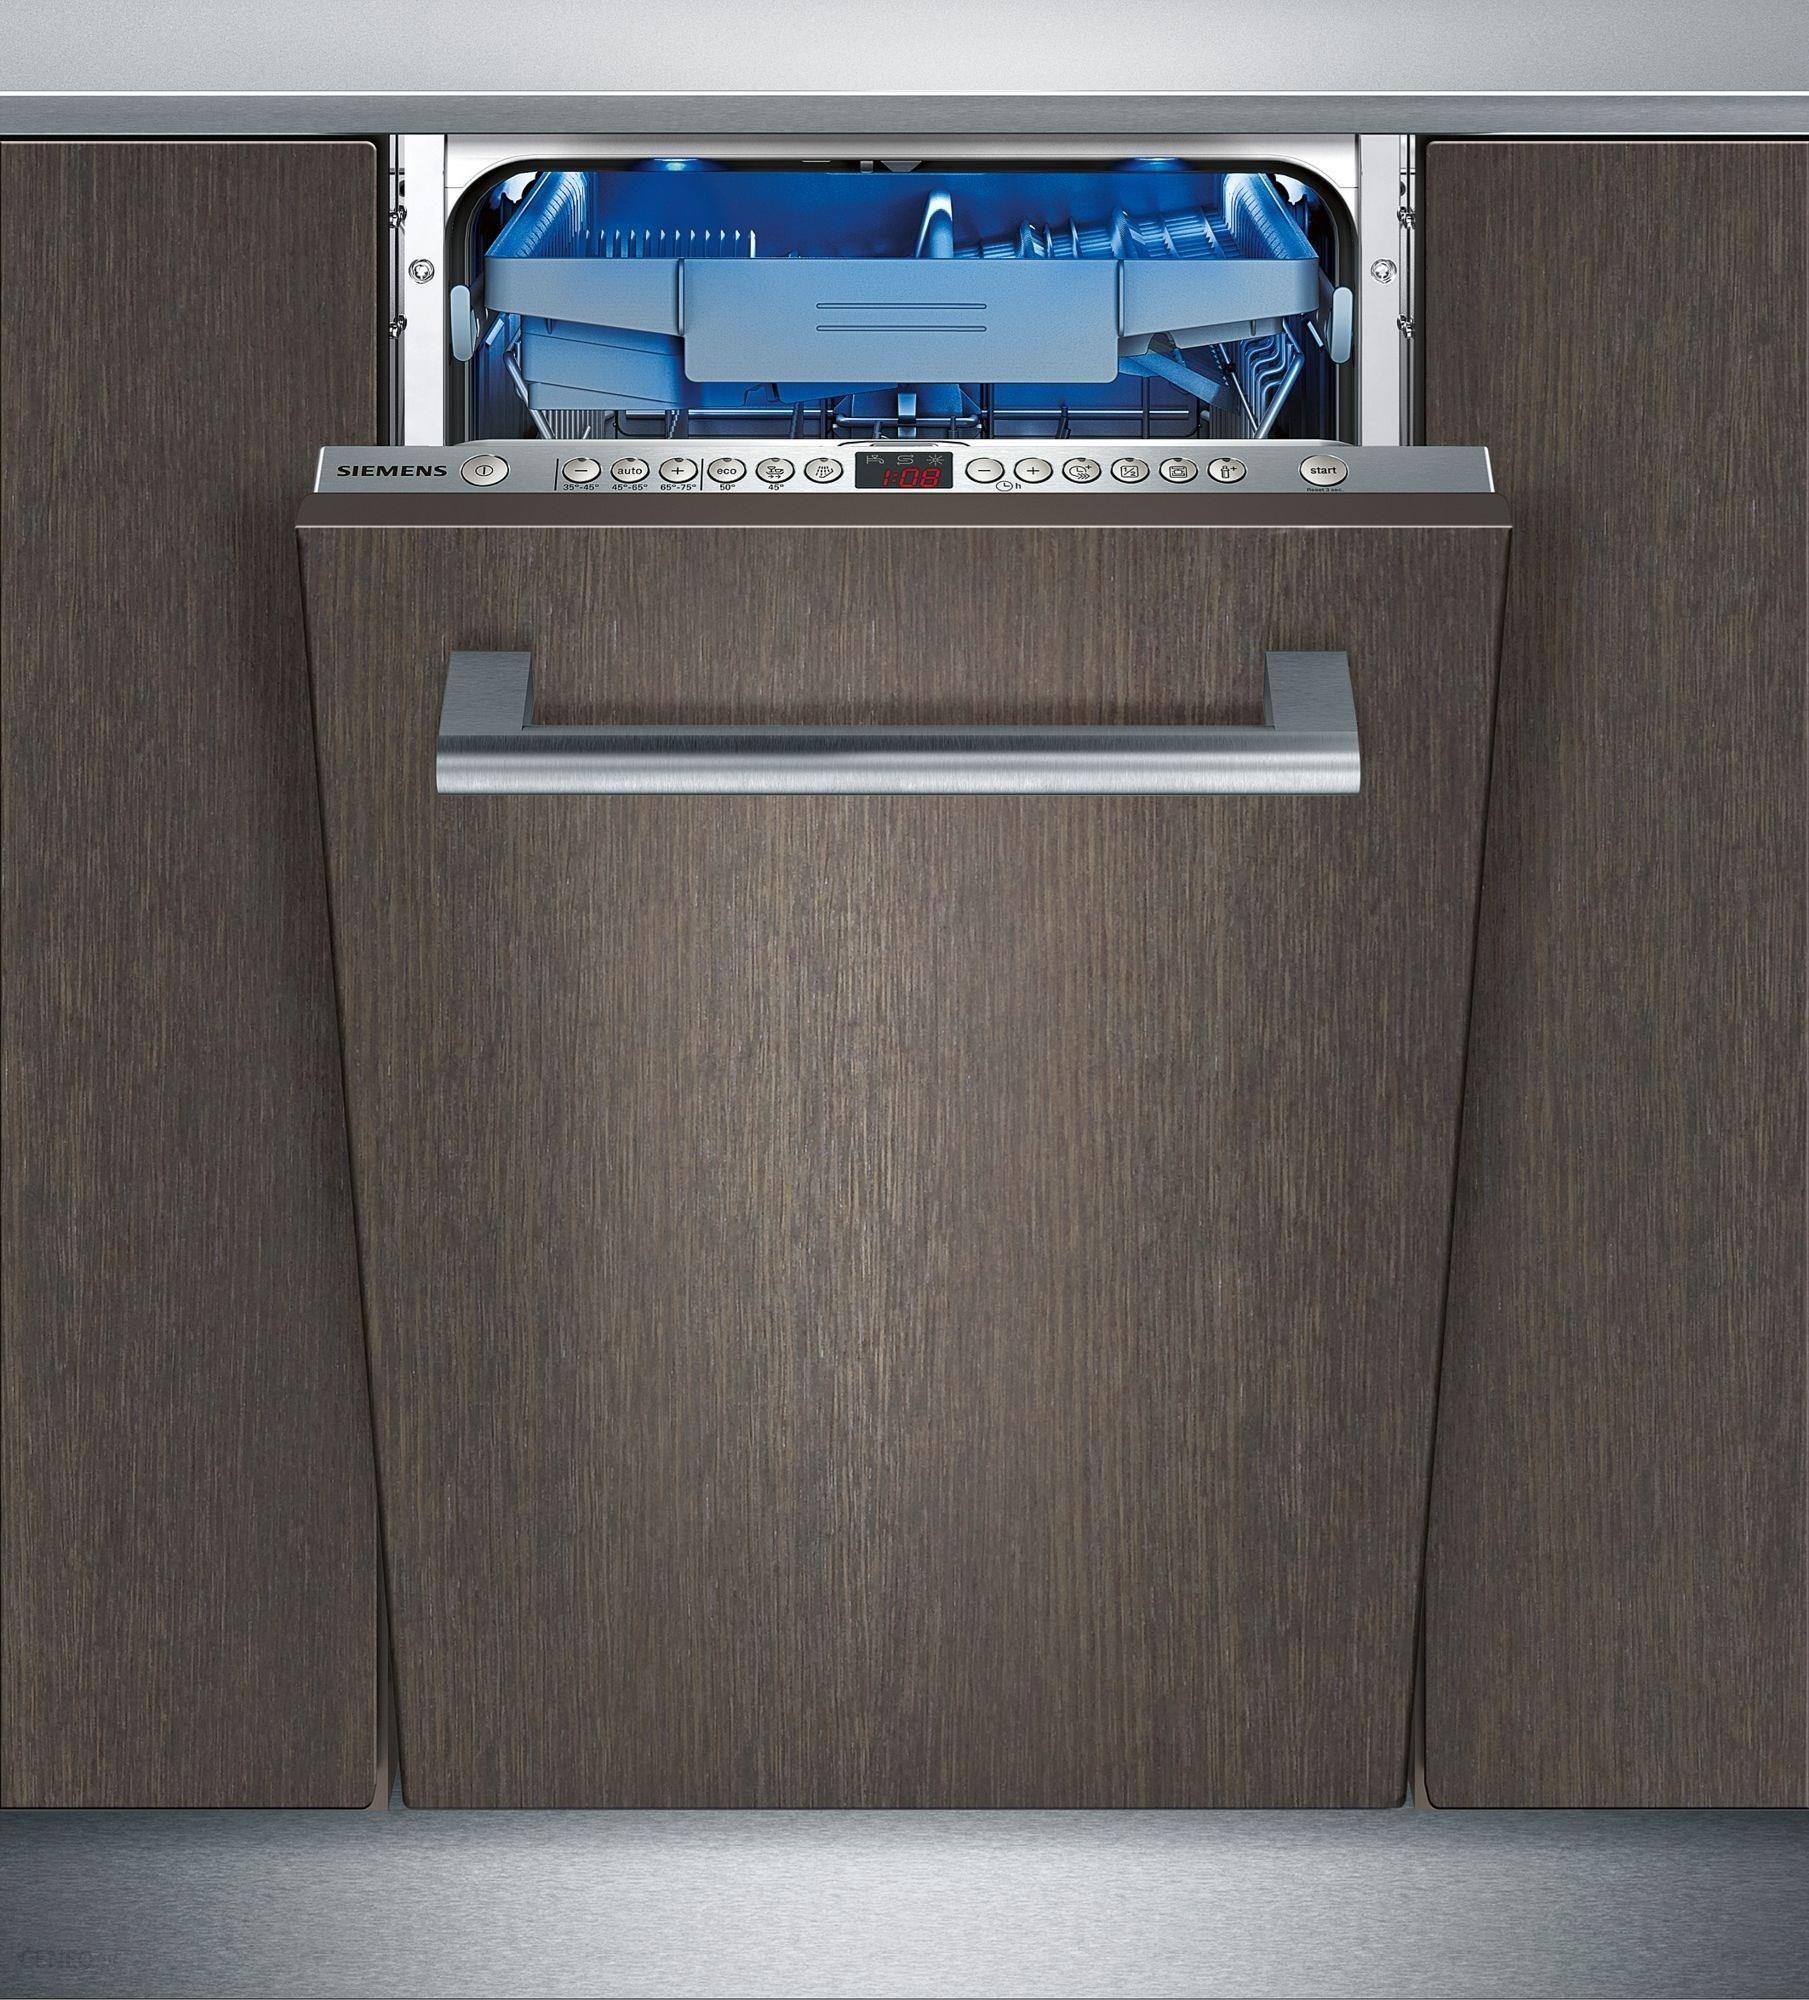 zmywarka do zabudowy siemens sr 66t096eu opinie i ceny na. Black Bedroom Furniture Sets. Home Design Ideas